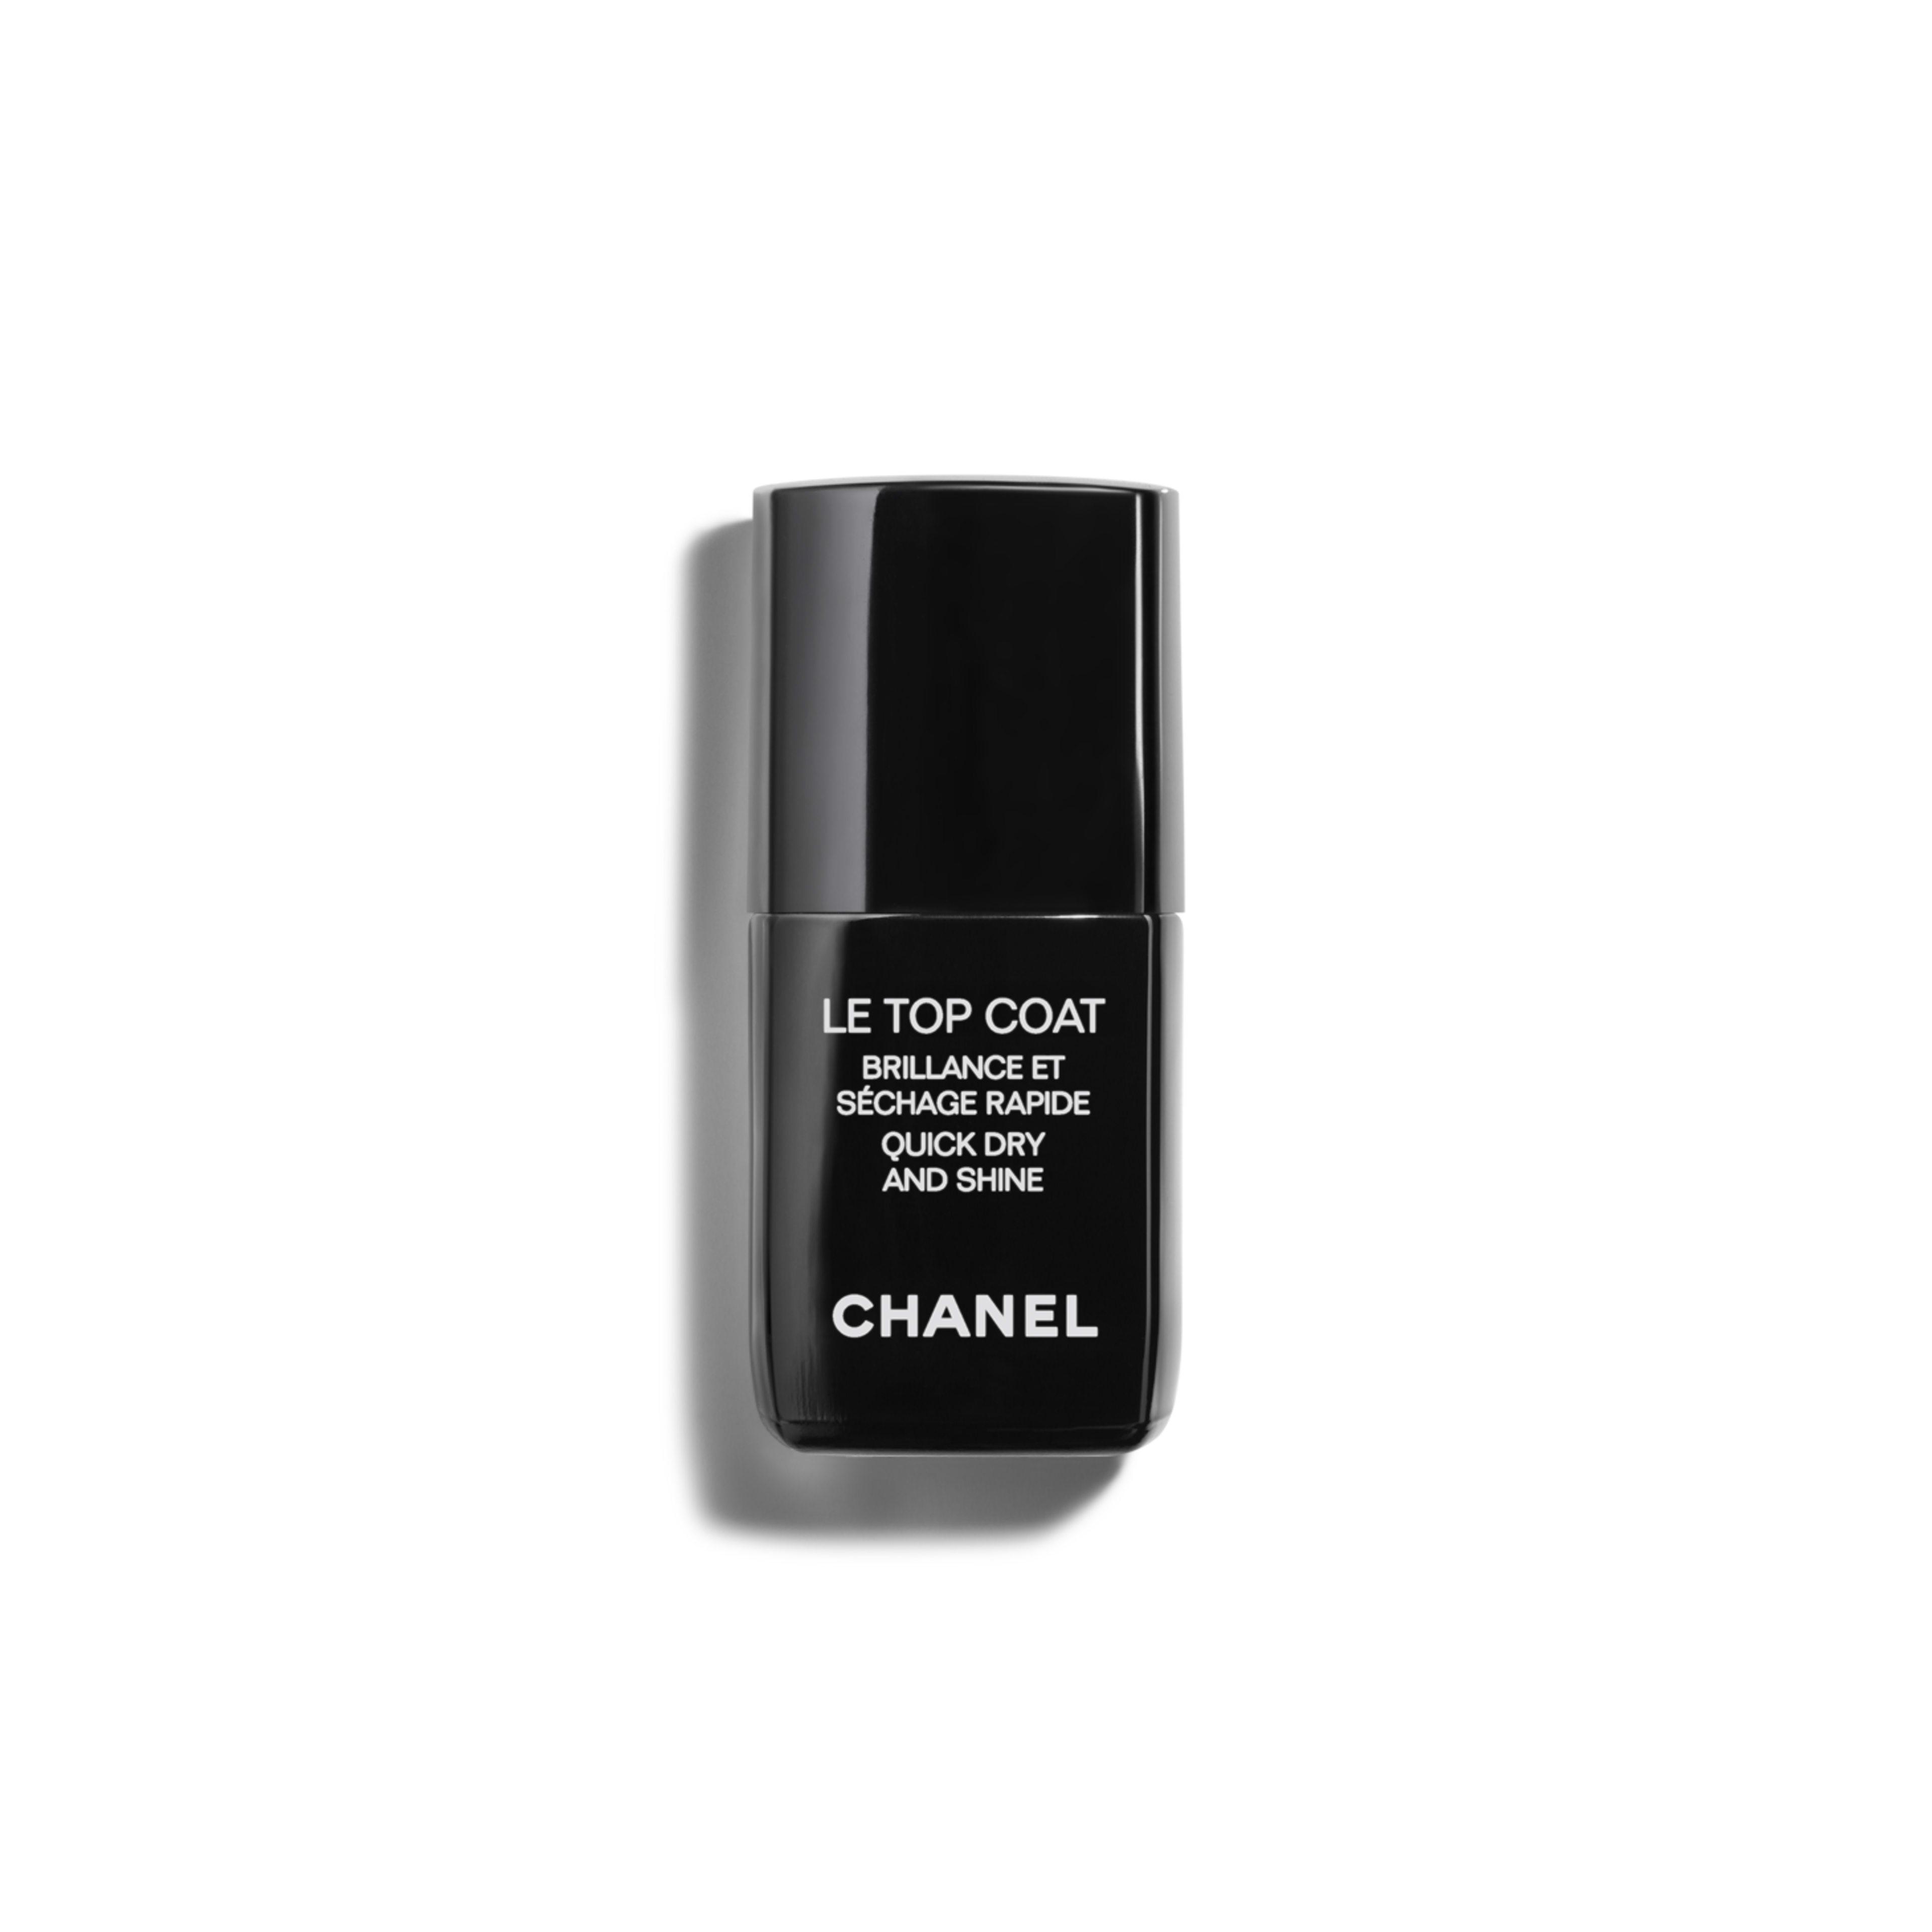 LE TOP COAT - makeup - 0.4FL. OZ. -                                                            default view - see full sized version